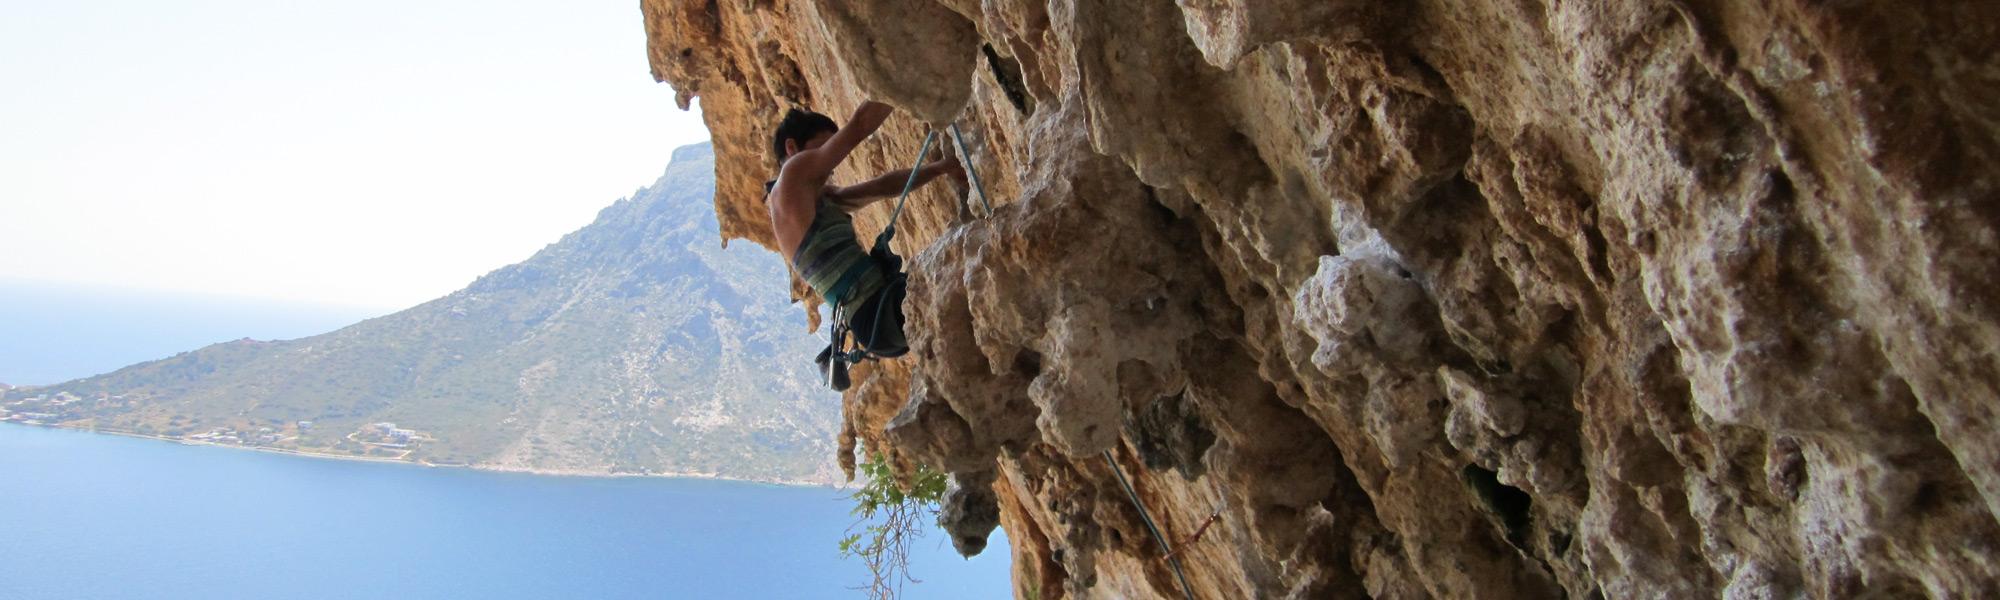 voyage voile et escalade Kalymnos et Turquie